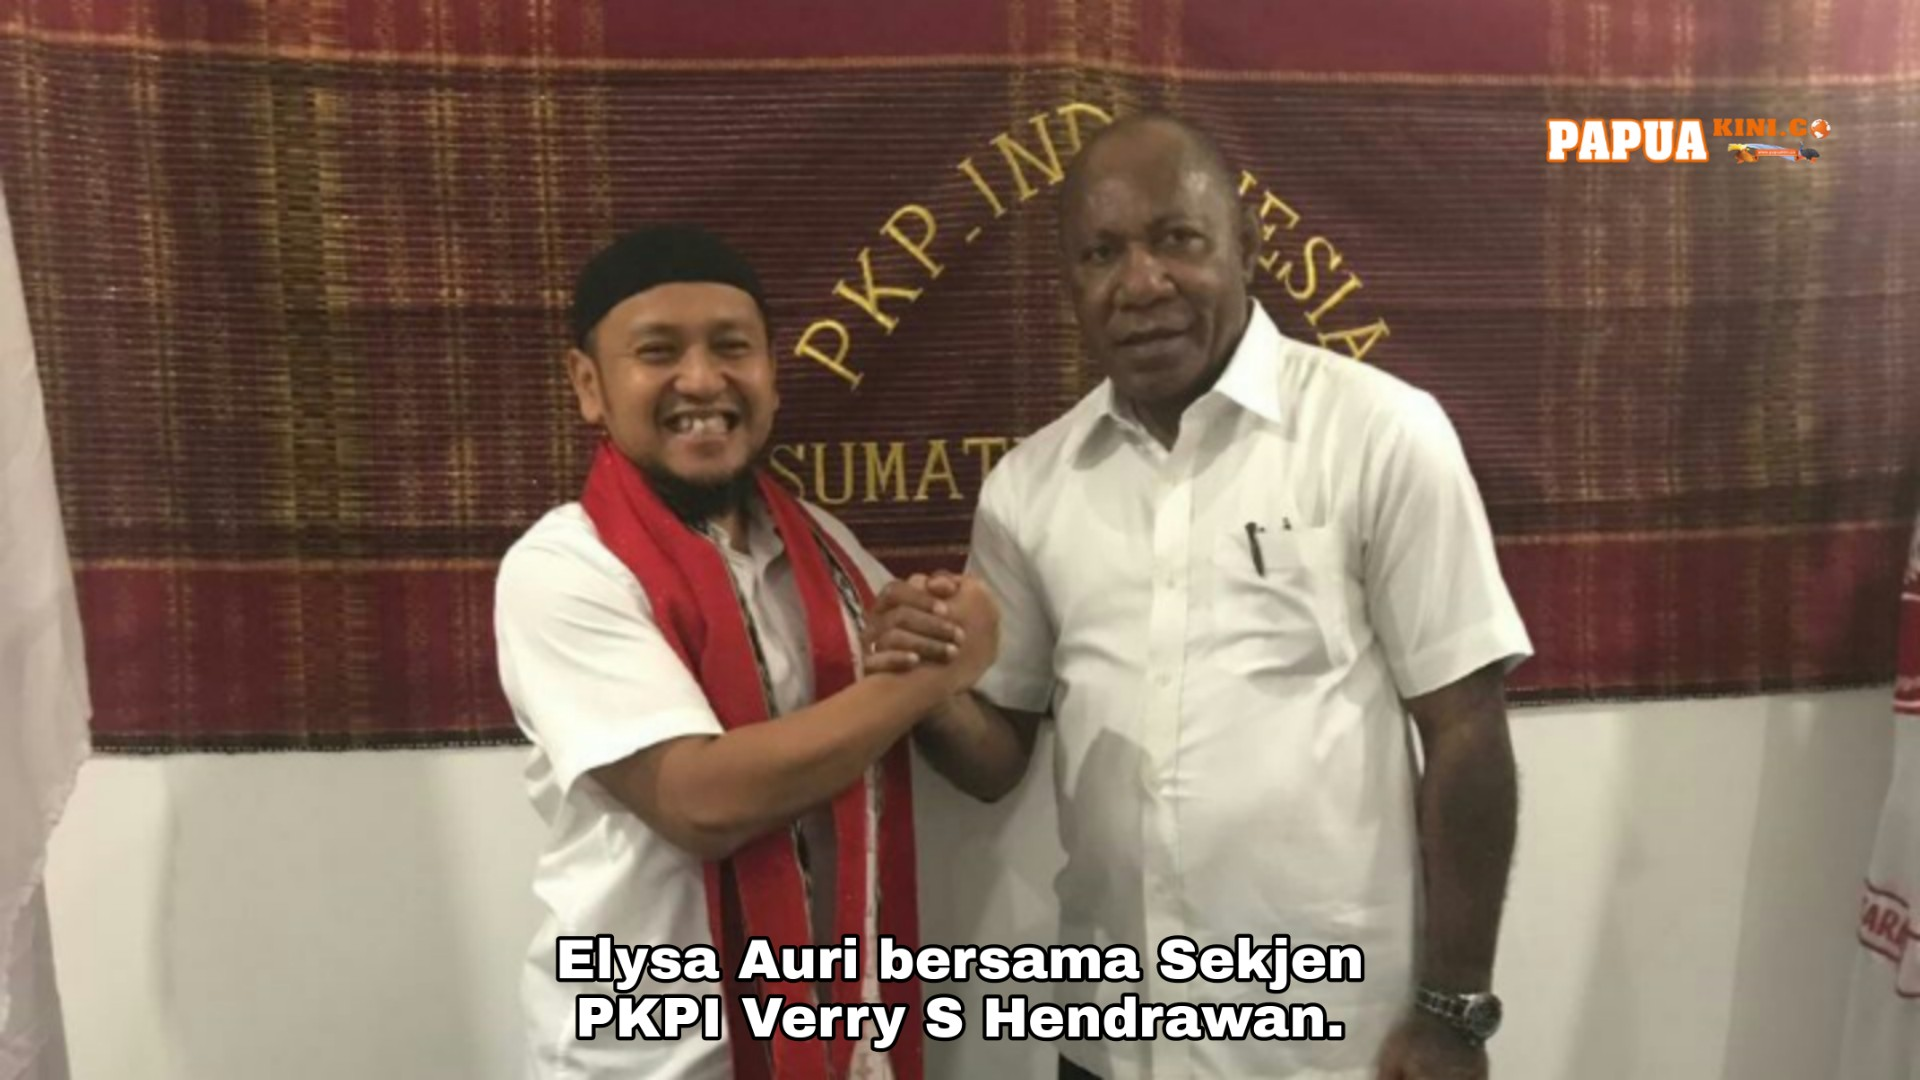 Perindo dan PKPI Bentuk Koalisi Dukung Elysa Auri di Pilkada Wondama